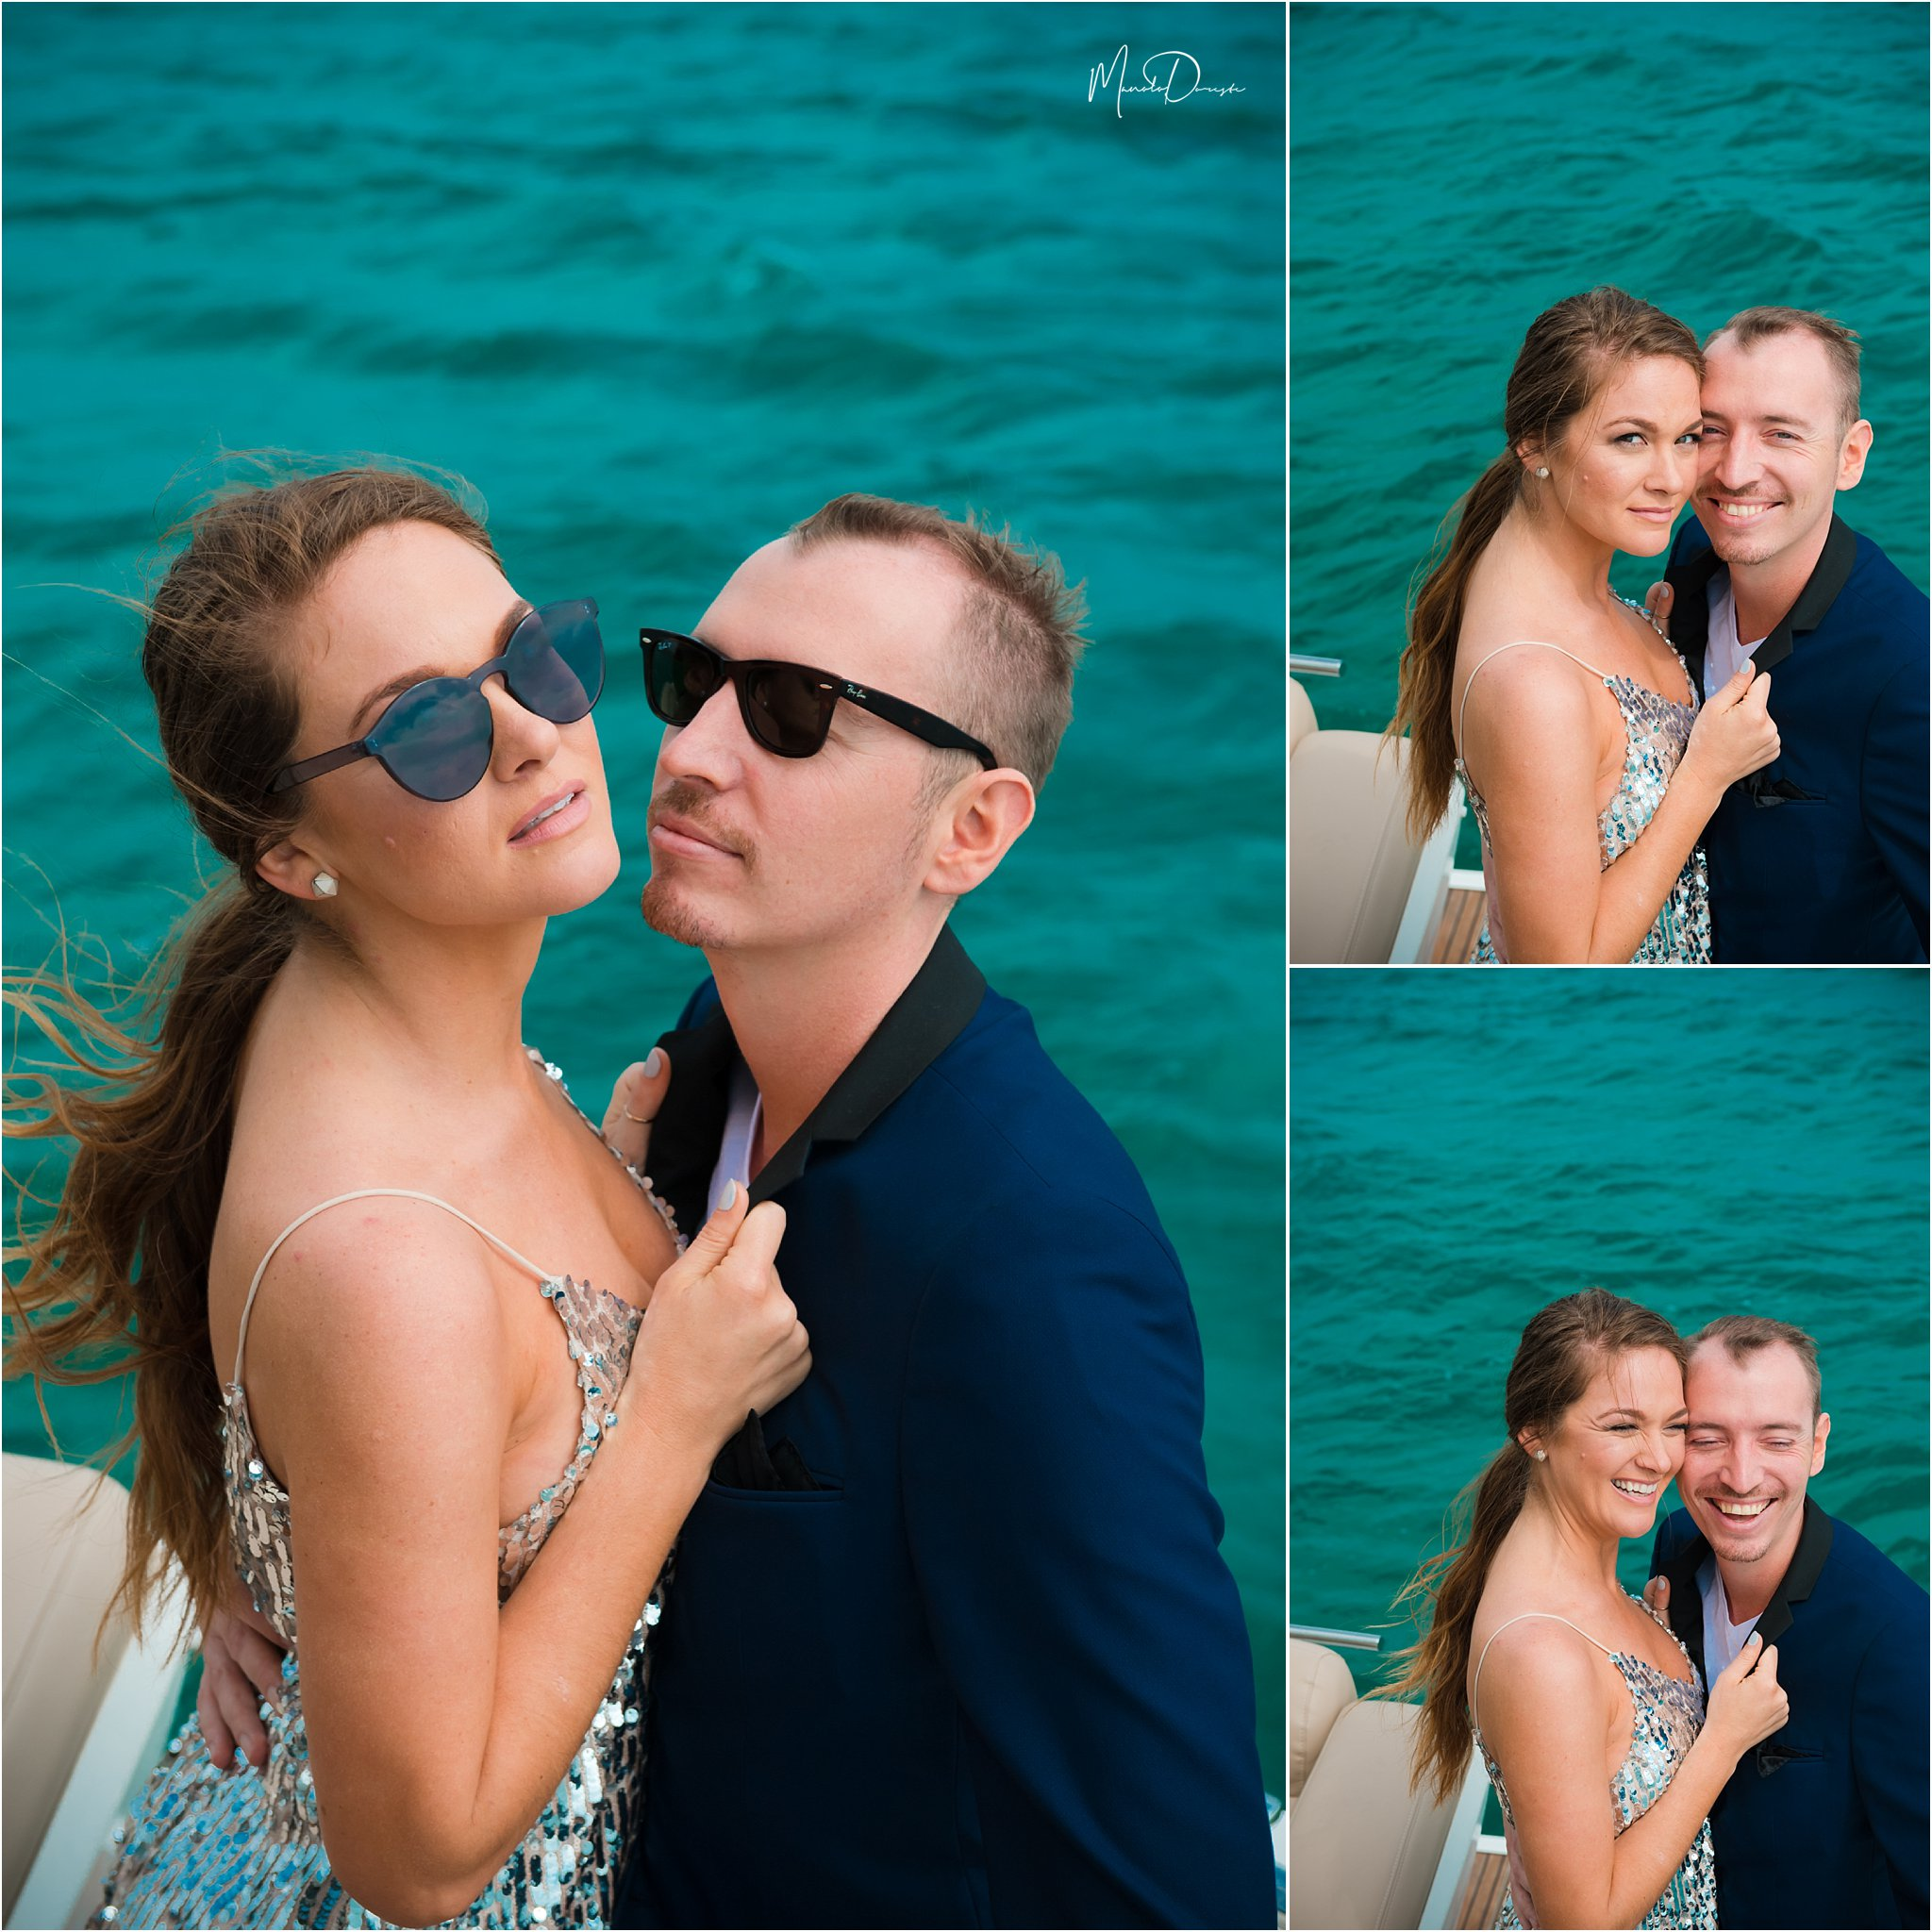 00905_ManoloDoreste_InFocusStudios_Wedding_Family_Photography_Miami_MiamiPhotographer.jpg